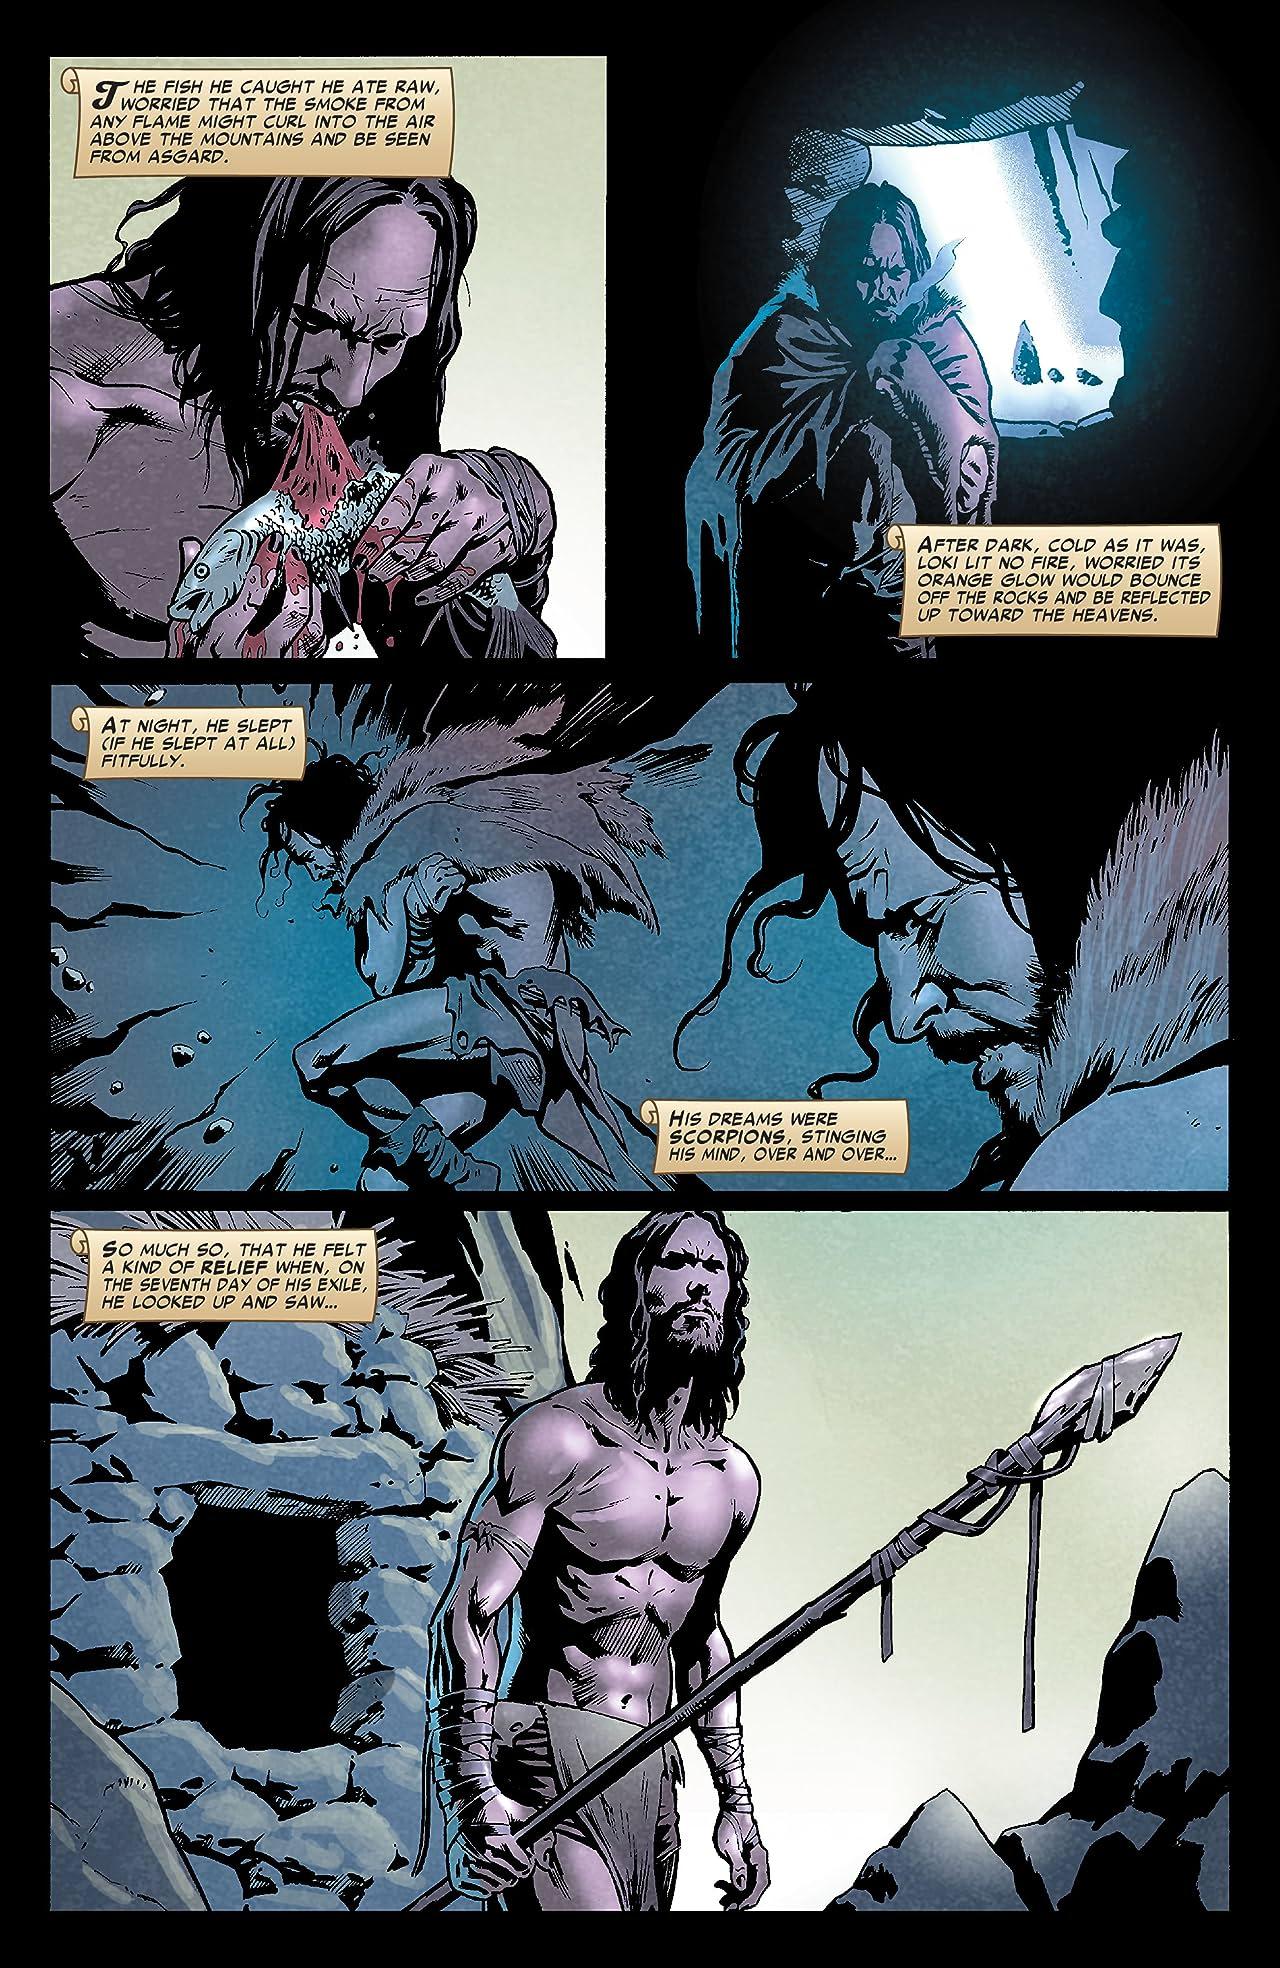 The Trials Of Loki: Marvel Tales #1